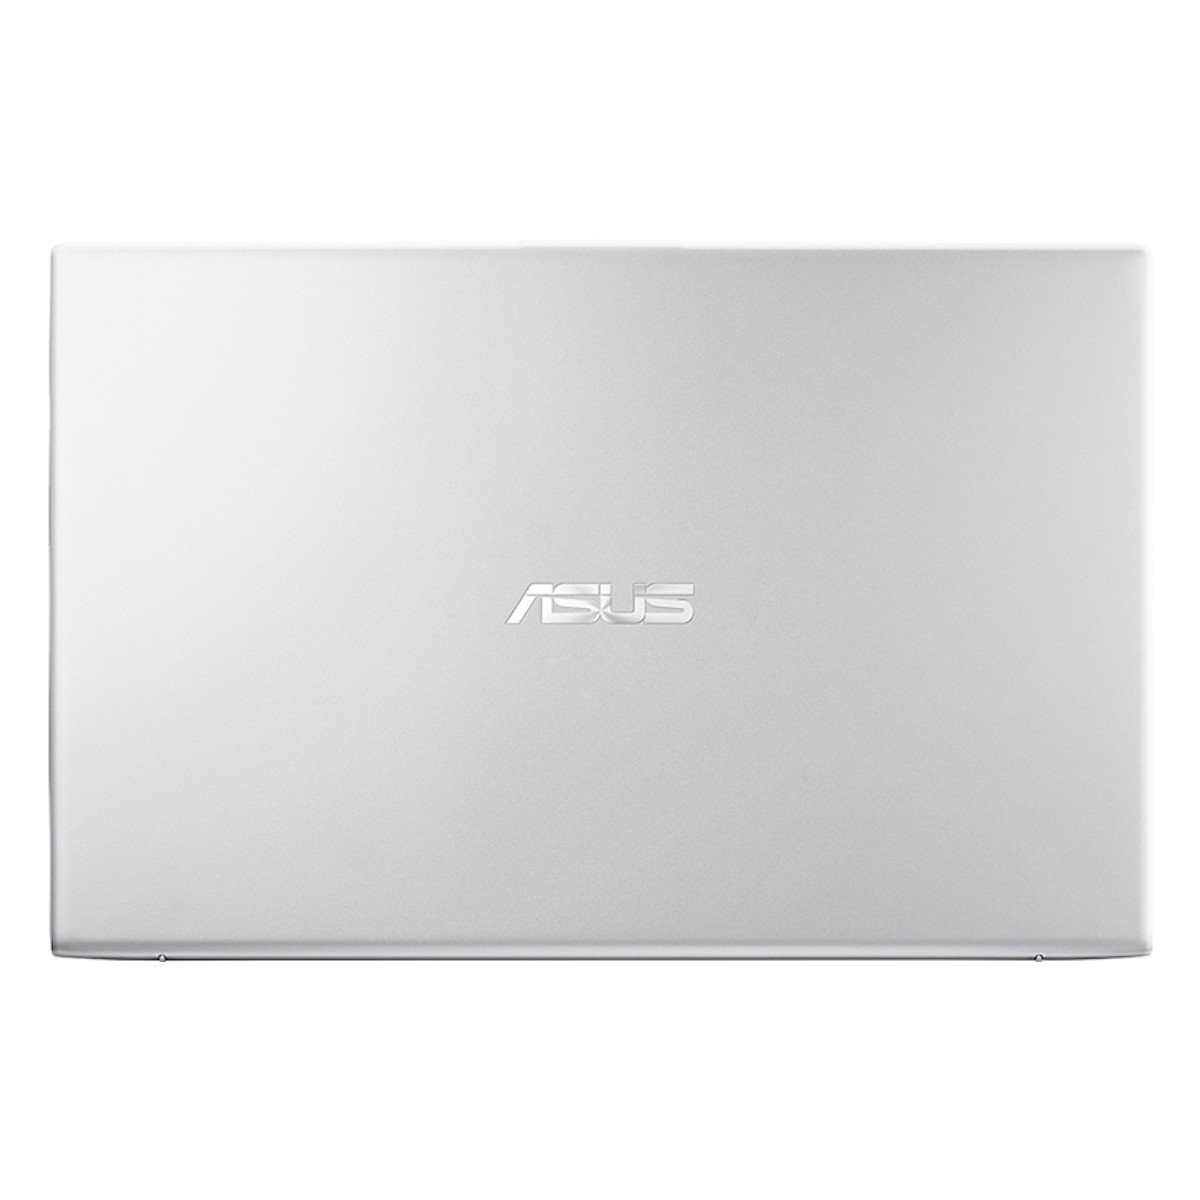 Asus A412FA i3-8145U 256GB SSD EK377T